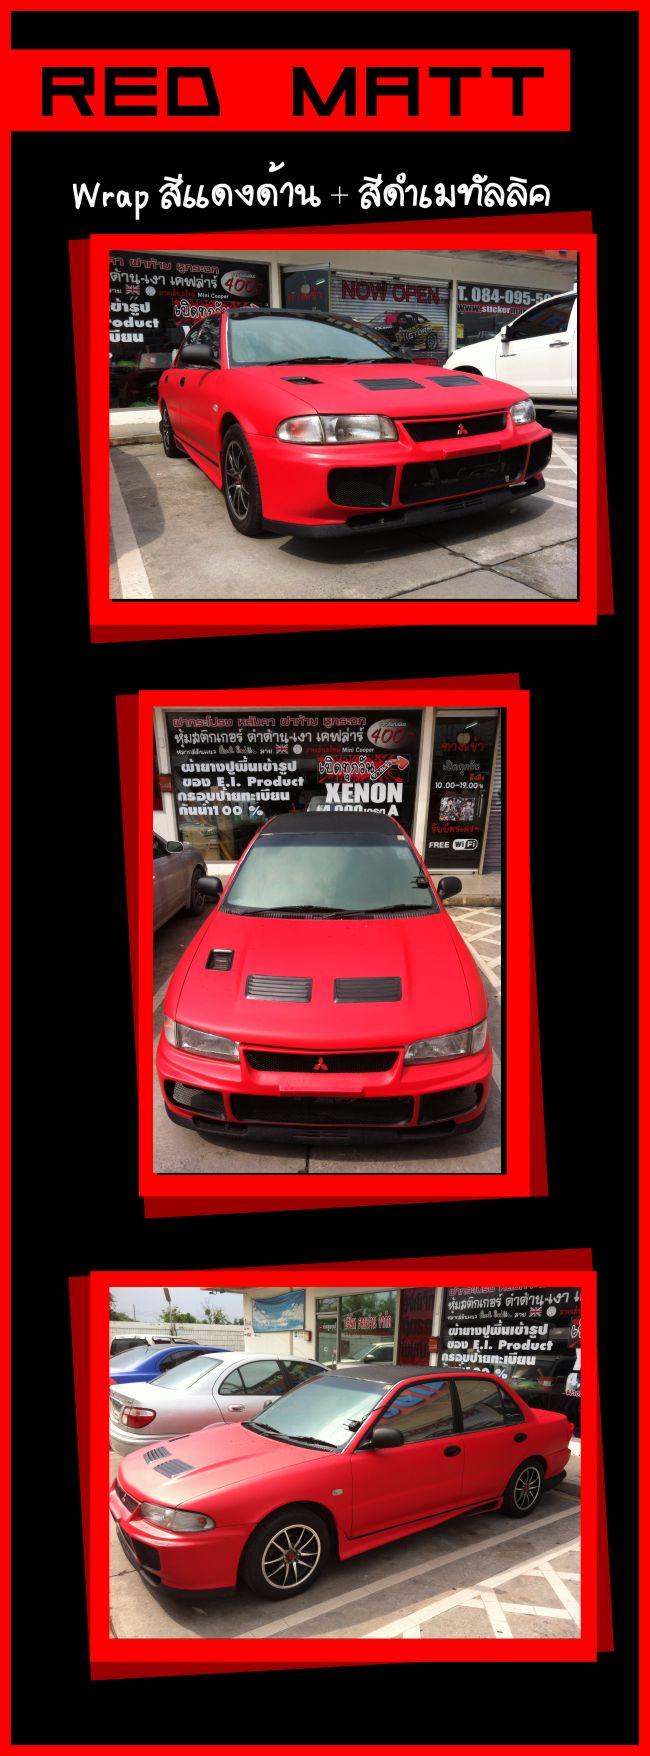 wrap car ฟิล์มหุ้มเปลี่ยนสีรถ เปลี่ยนสีรถทั้งคันด้วยสติกเกอร์ wrapเปลี่ยนสีรถ เปลี่ยนสีรถดำด้าน สติกเกอร์เปลี่ยนสีรถแดงด้าน